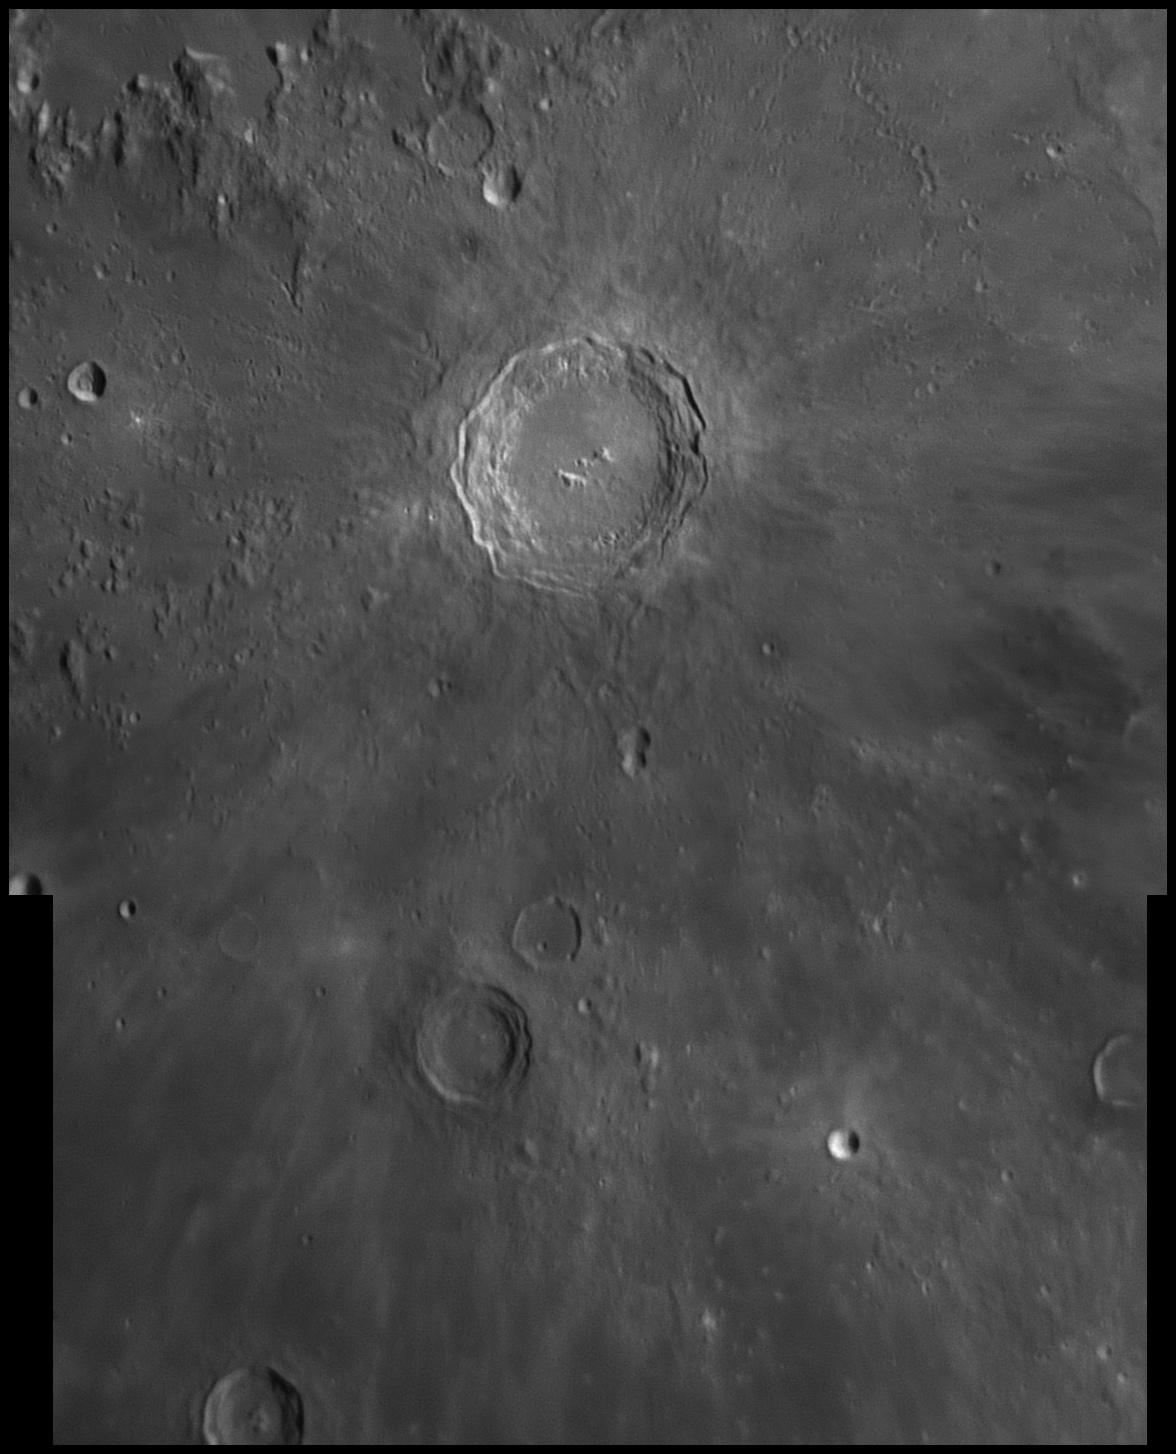 lune_2020_04_04_212756_212911.jpg.3e7cc59d57c56d766b25b97a296aa7a0.jpg